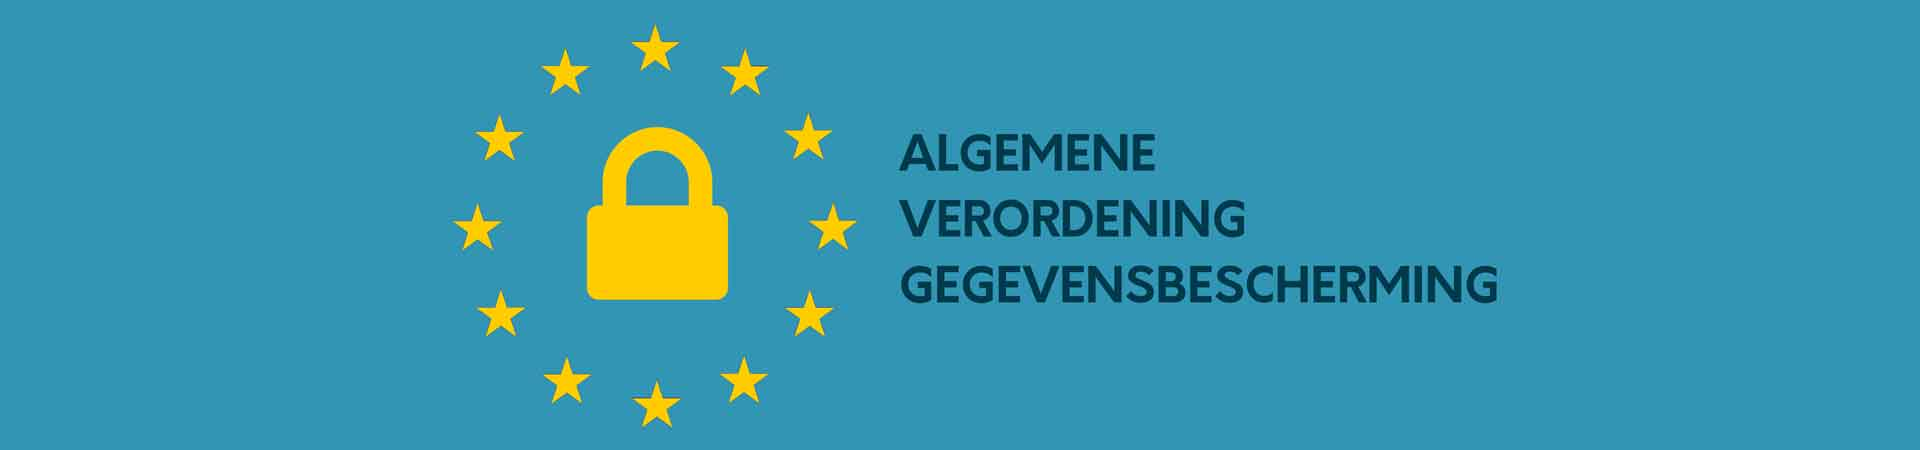 Algemene verordening persoonsgegevens - AVG Wet Hoveniers